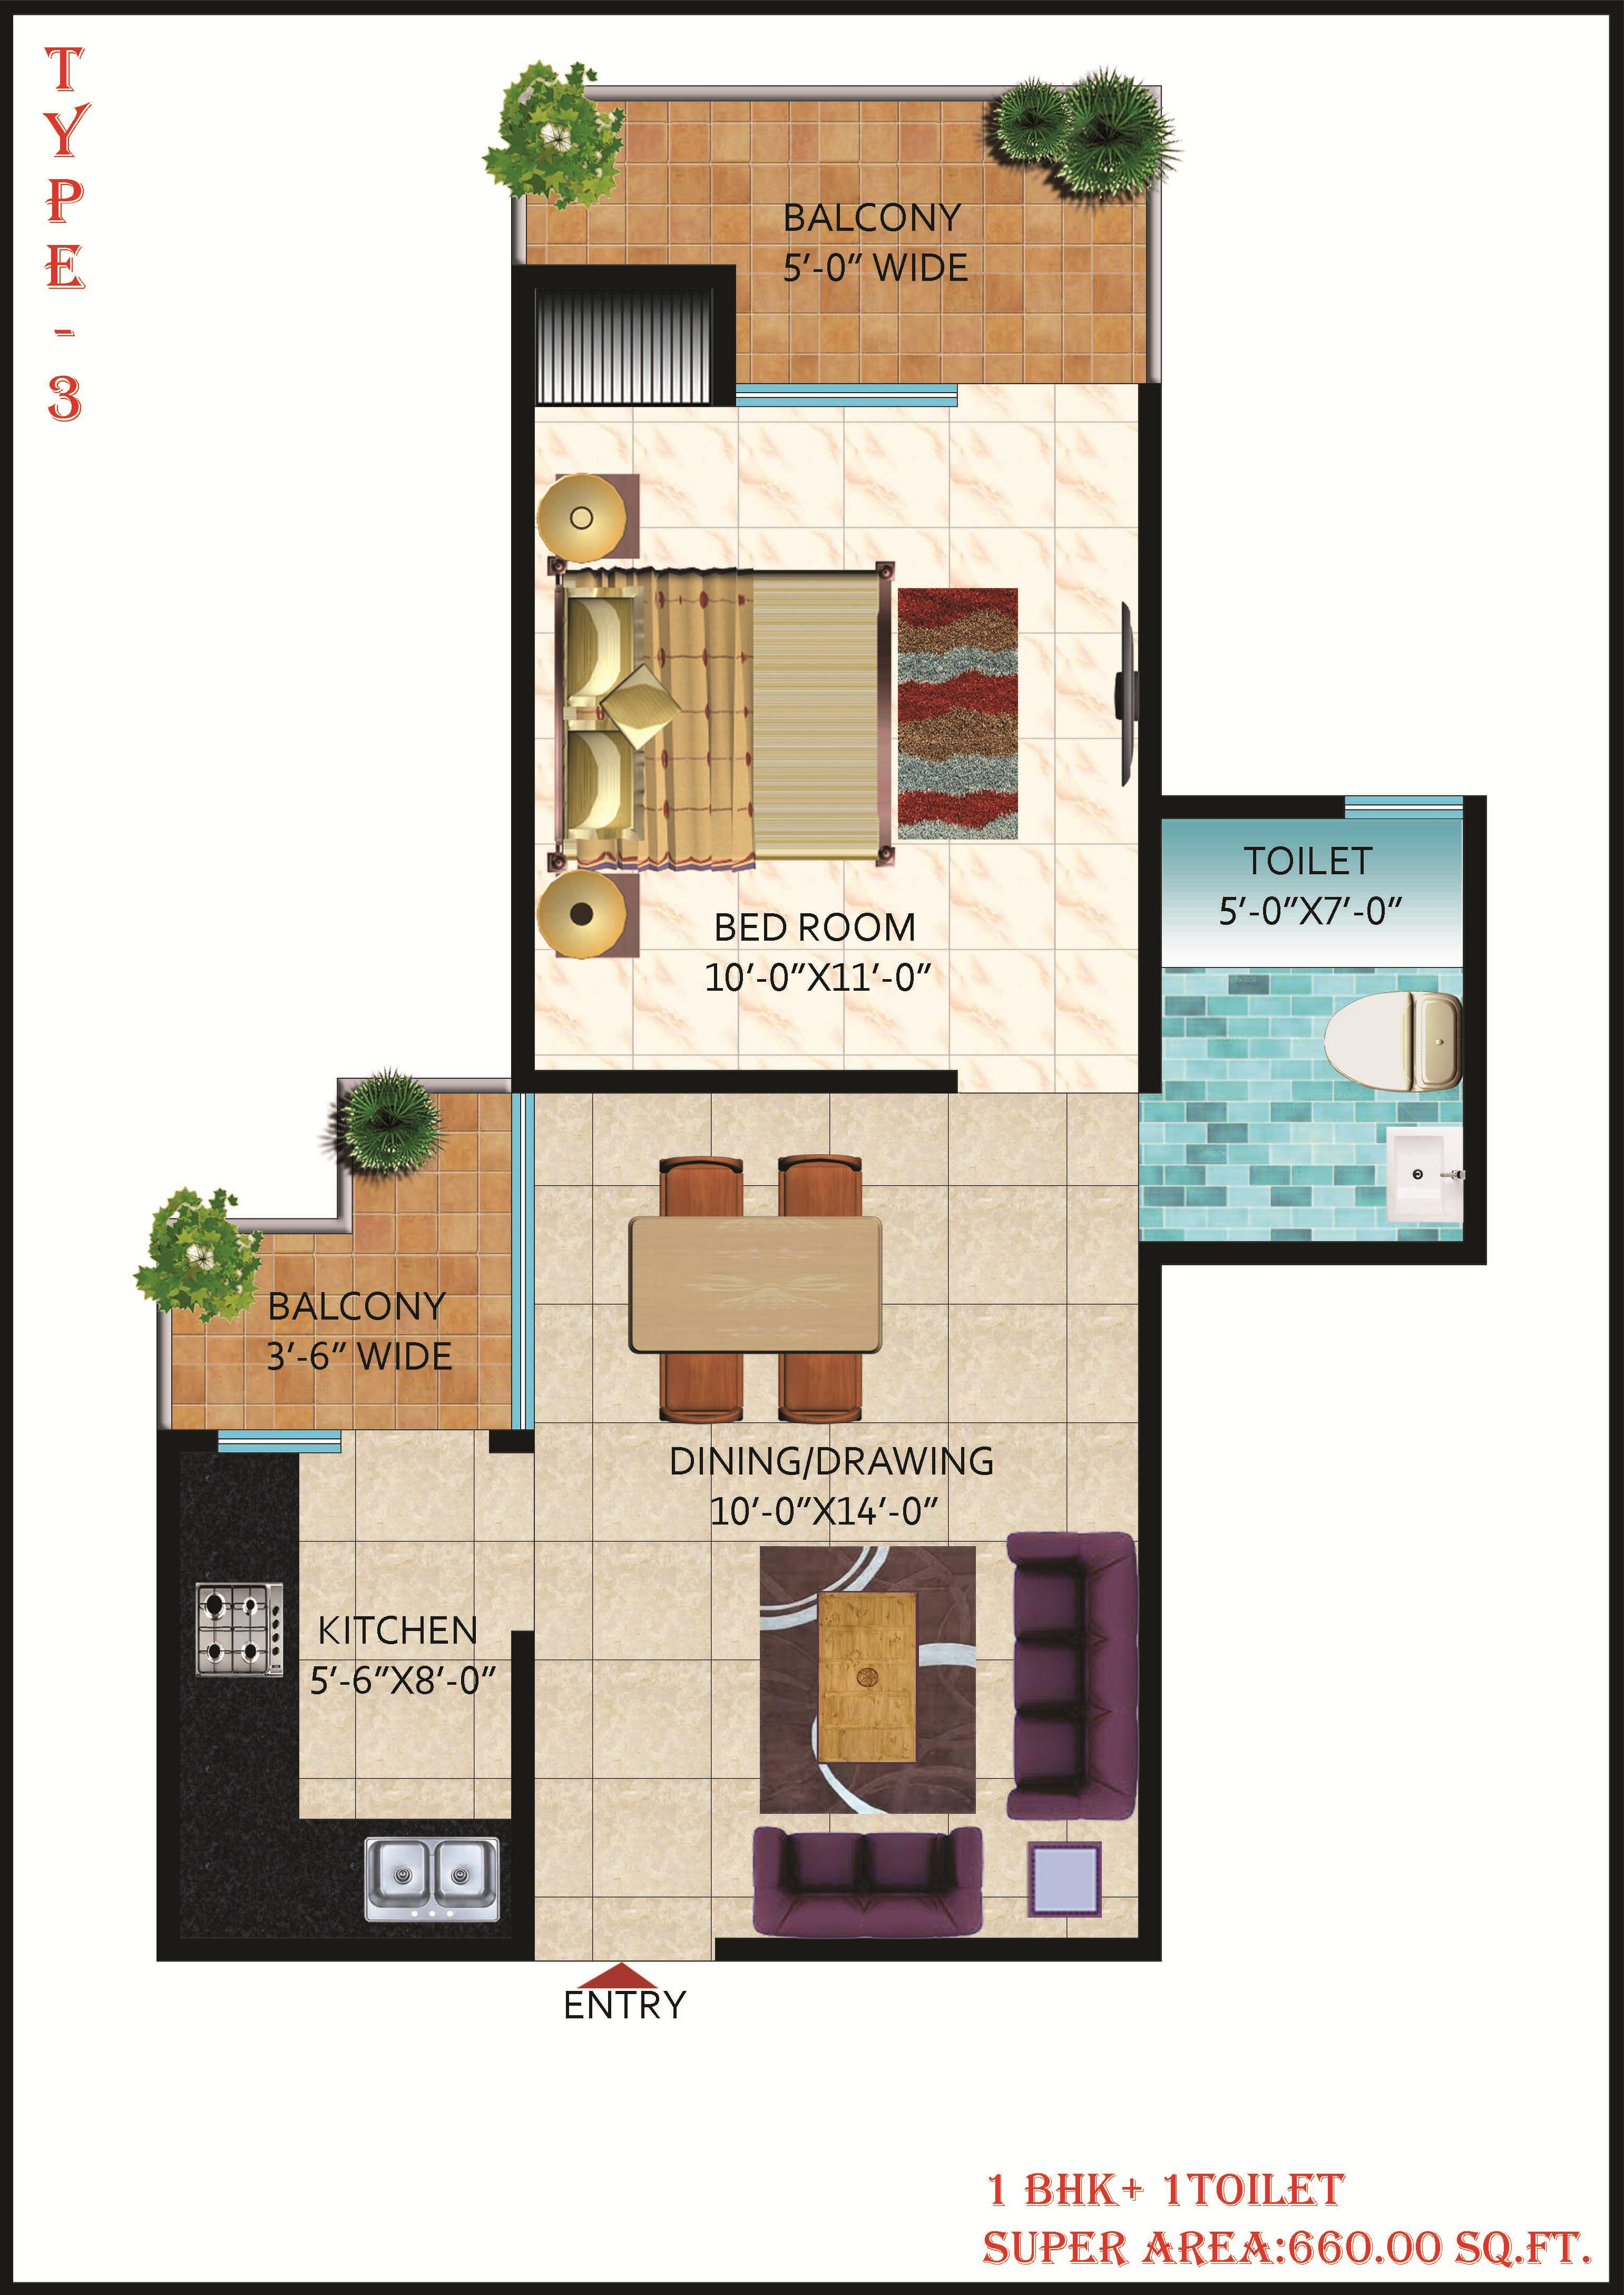 1 bhk layout